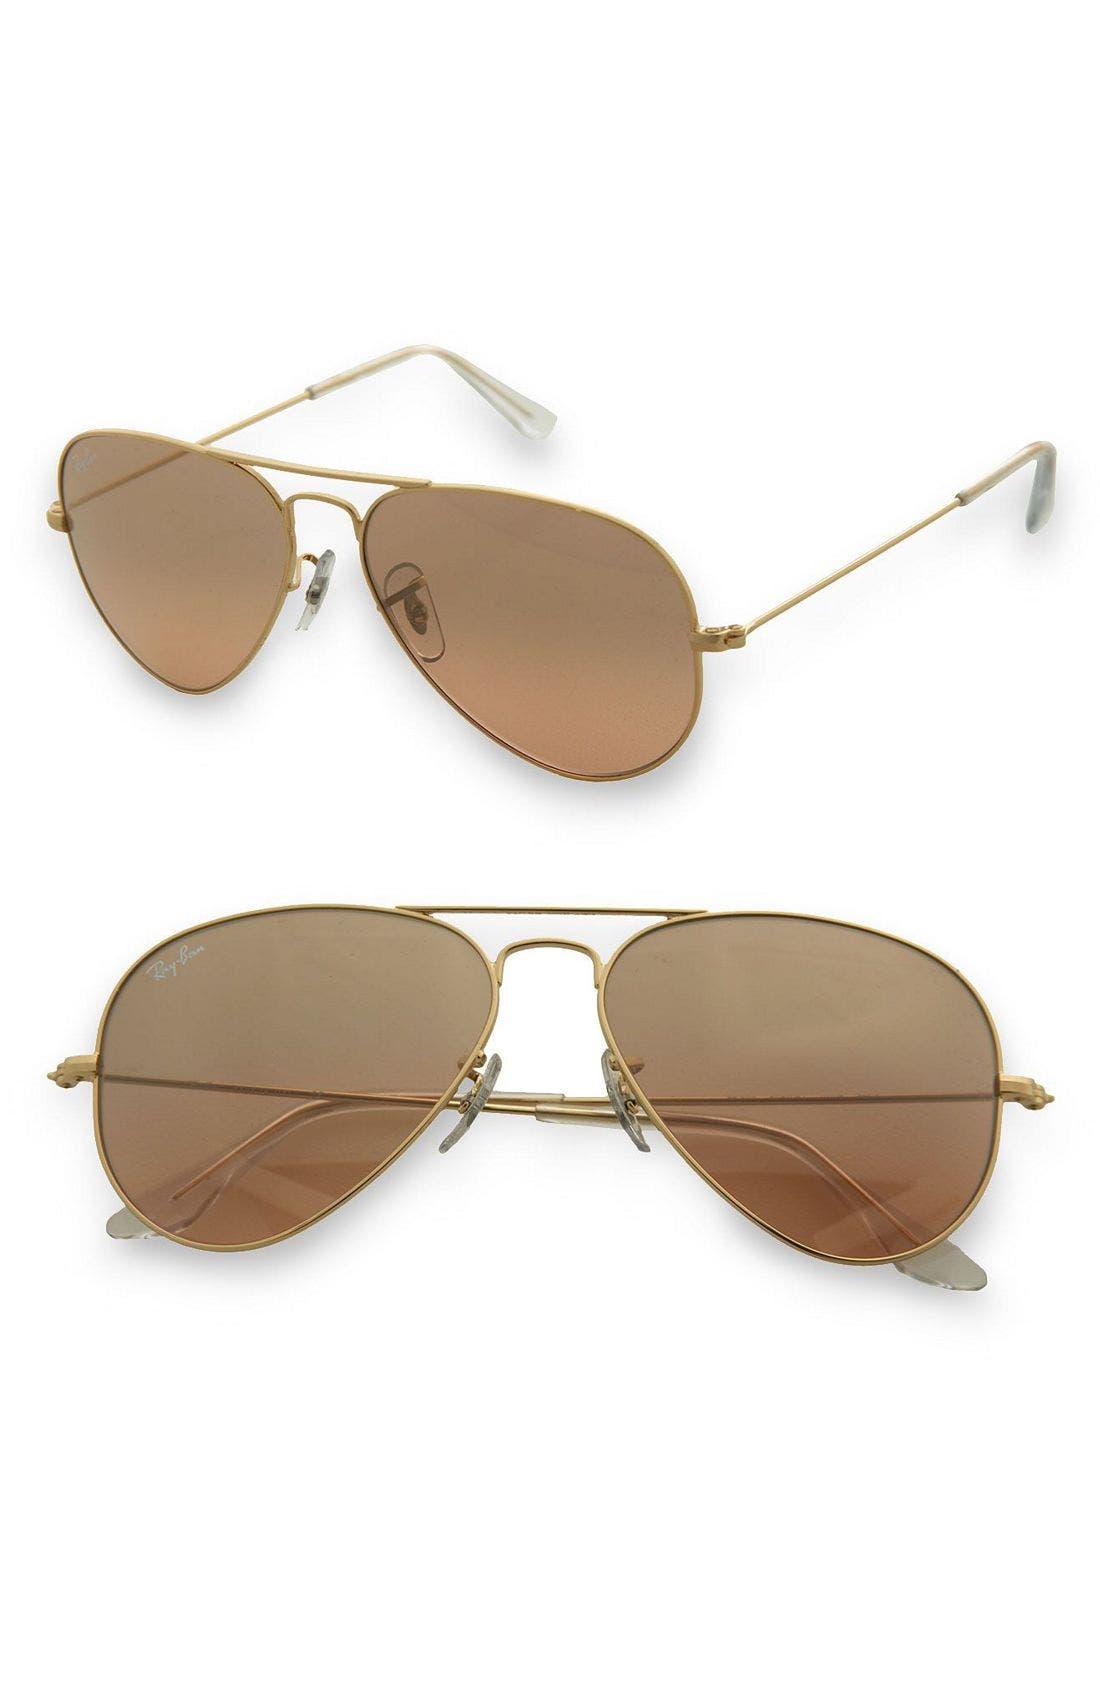 Main Image - Ray-Ban 'Original Aviator' 58mm Sunglasses